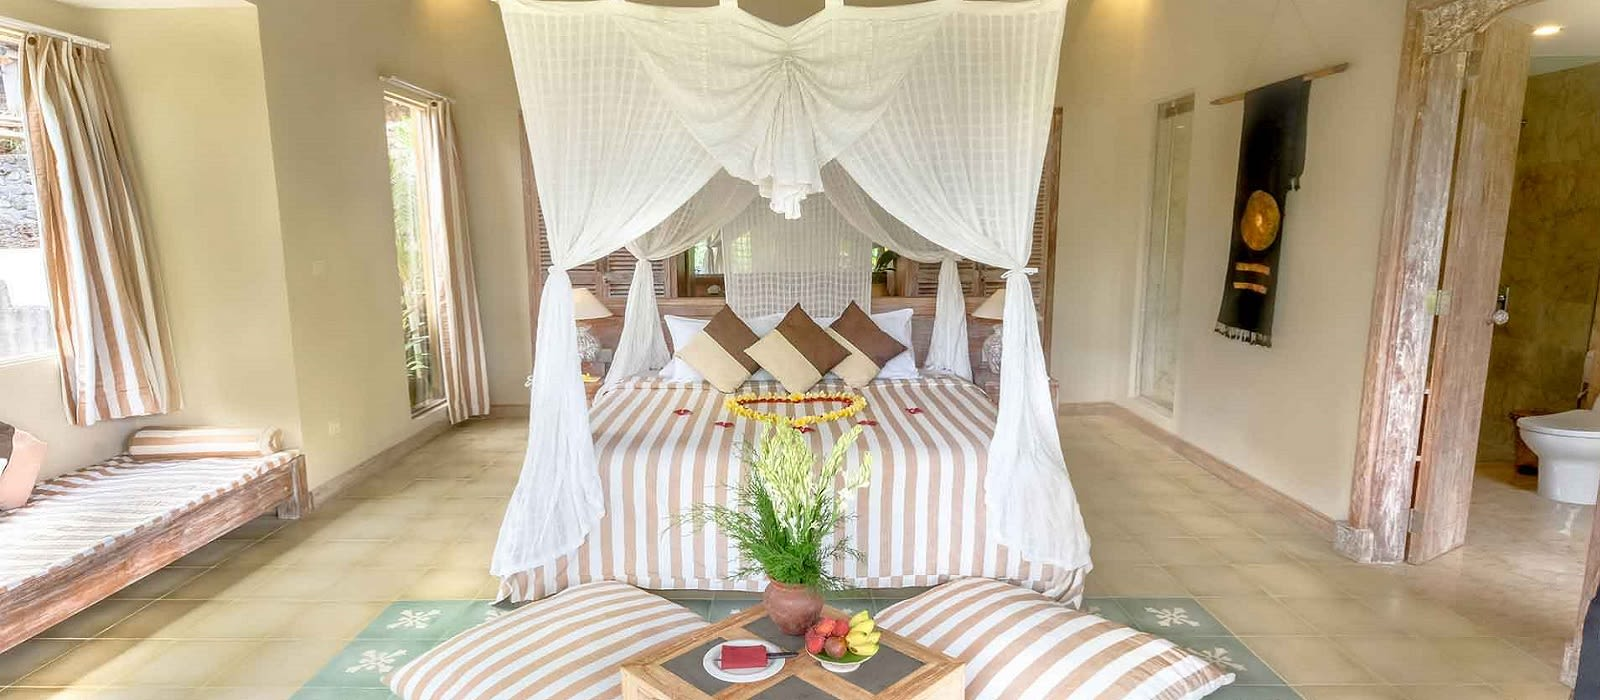 Hotel Wapa di Ume Sideman Indonesien